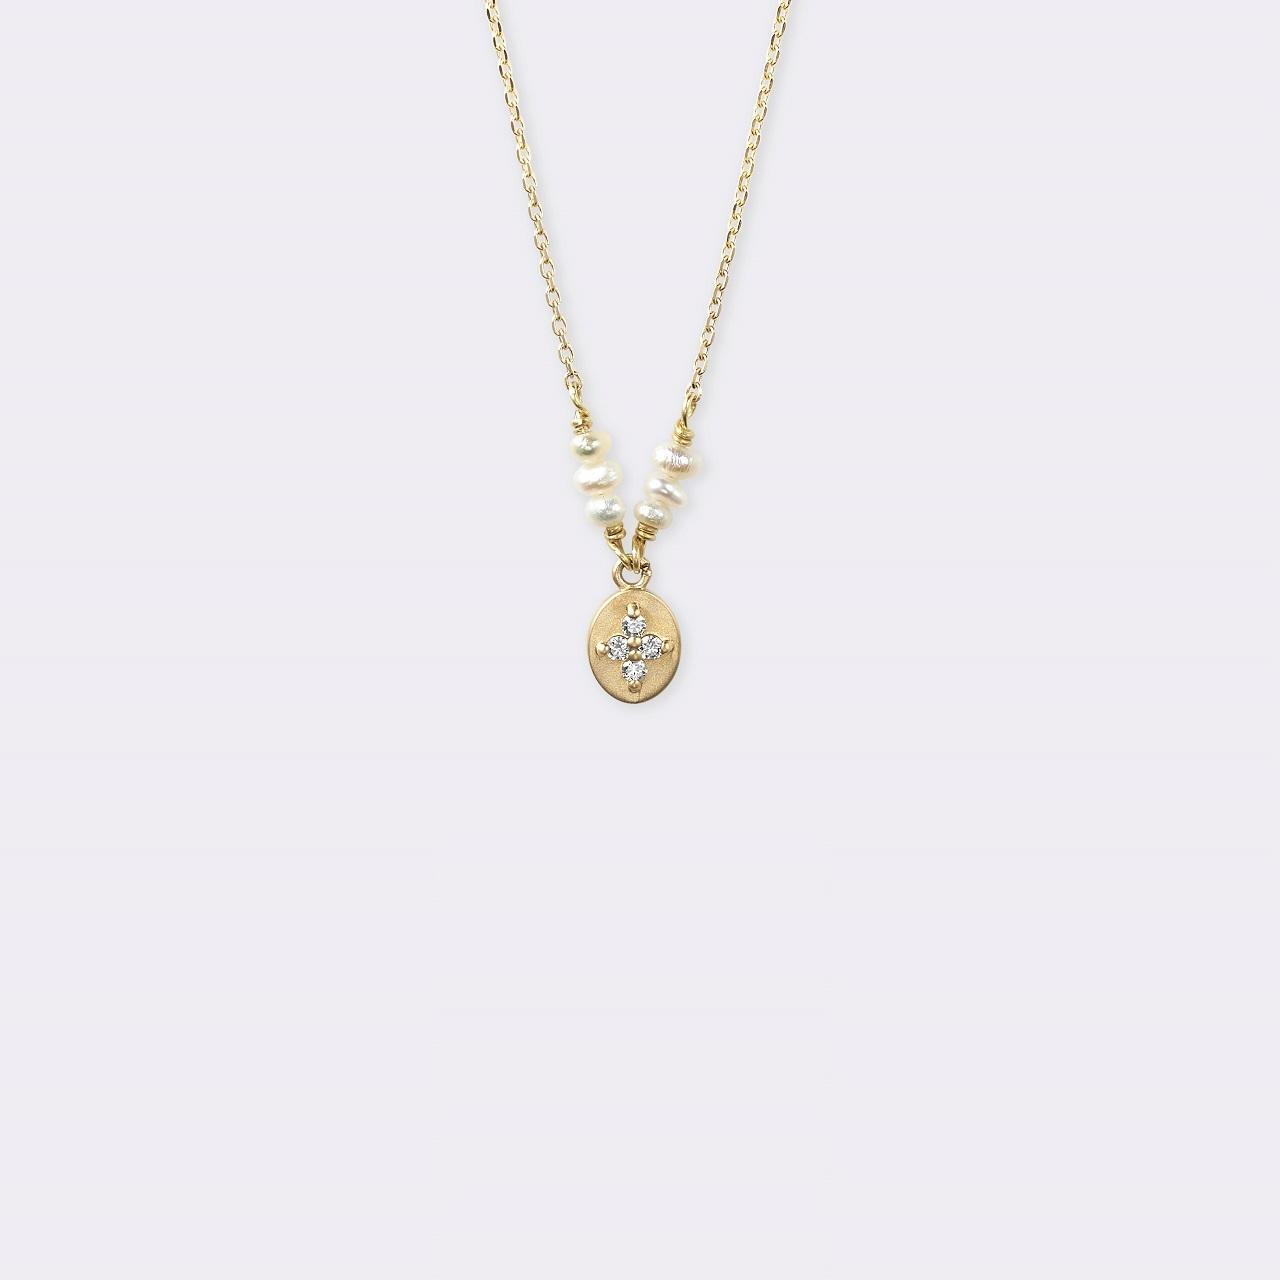 Petal Necklace K18YG(ペタルネックレス K18イエローゴールド)